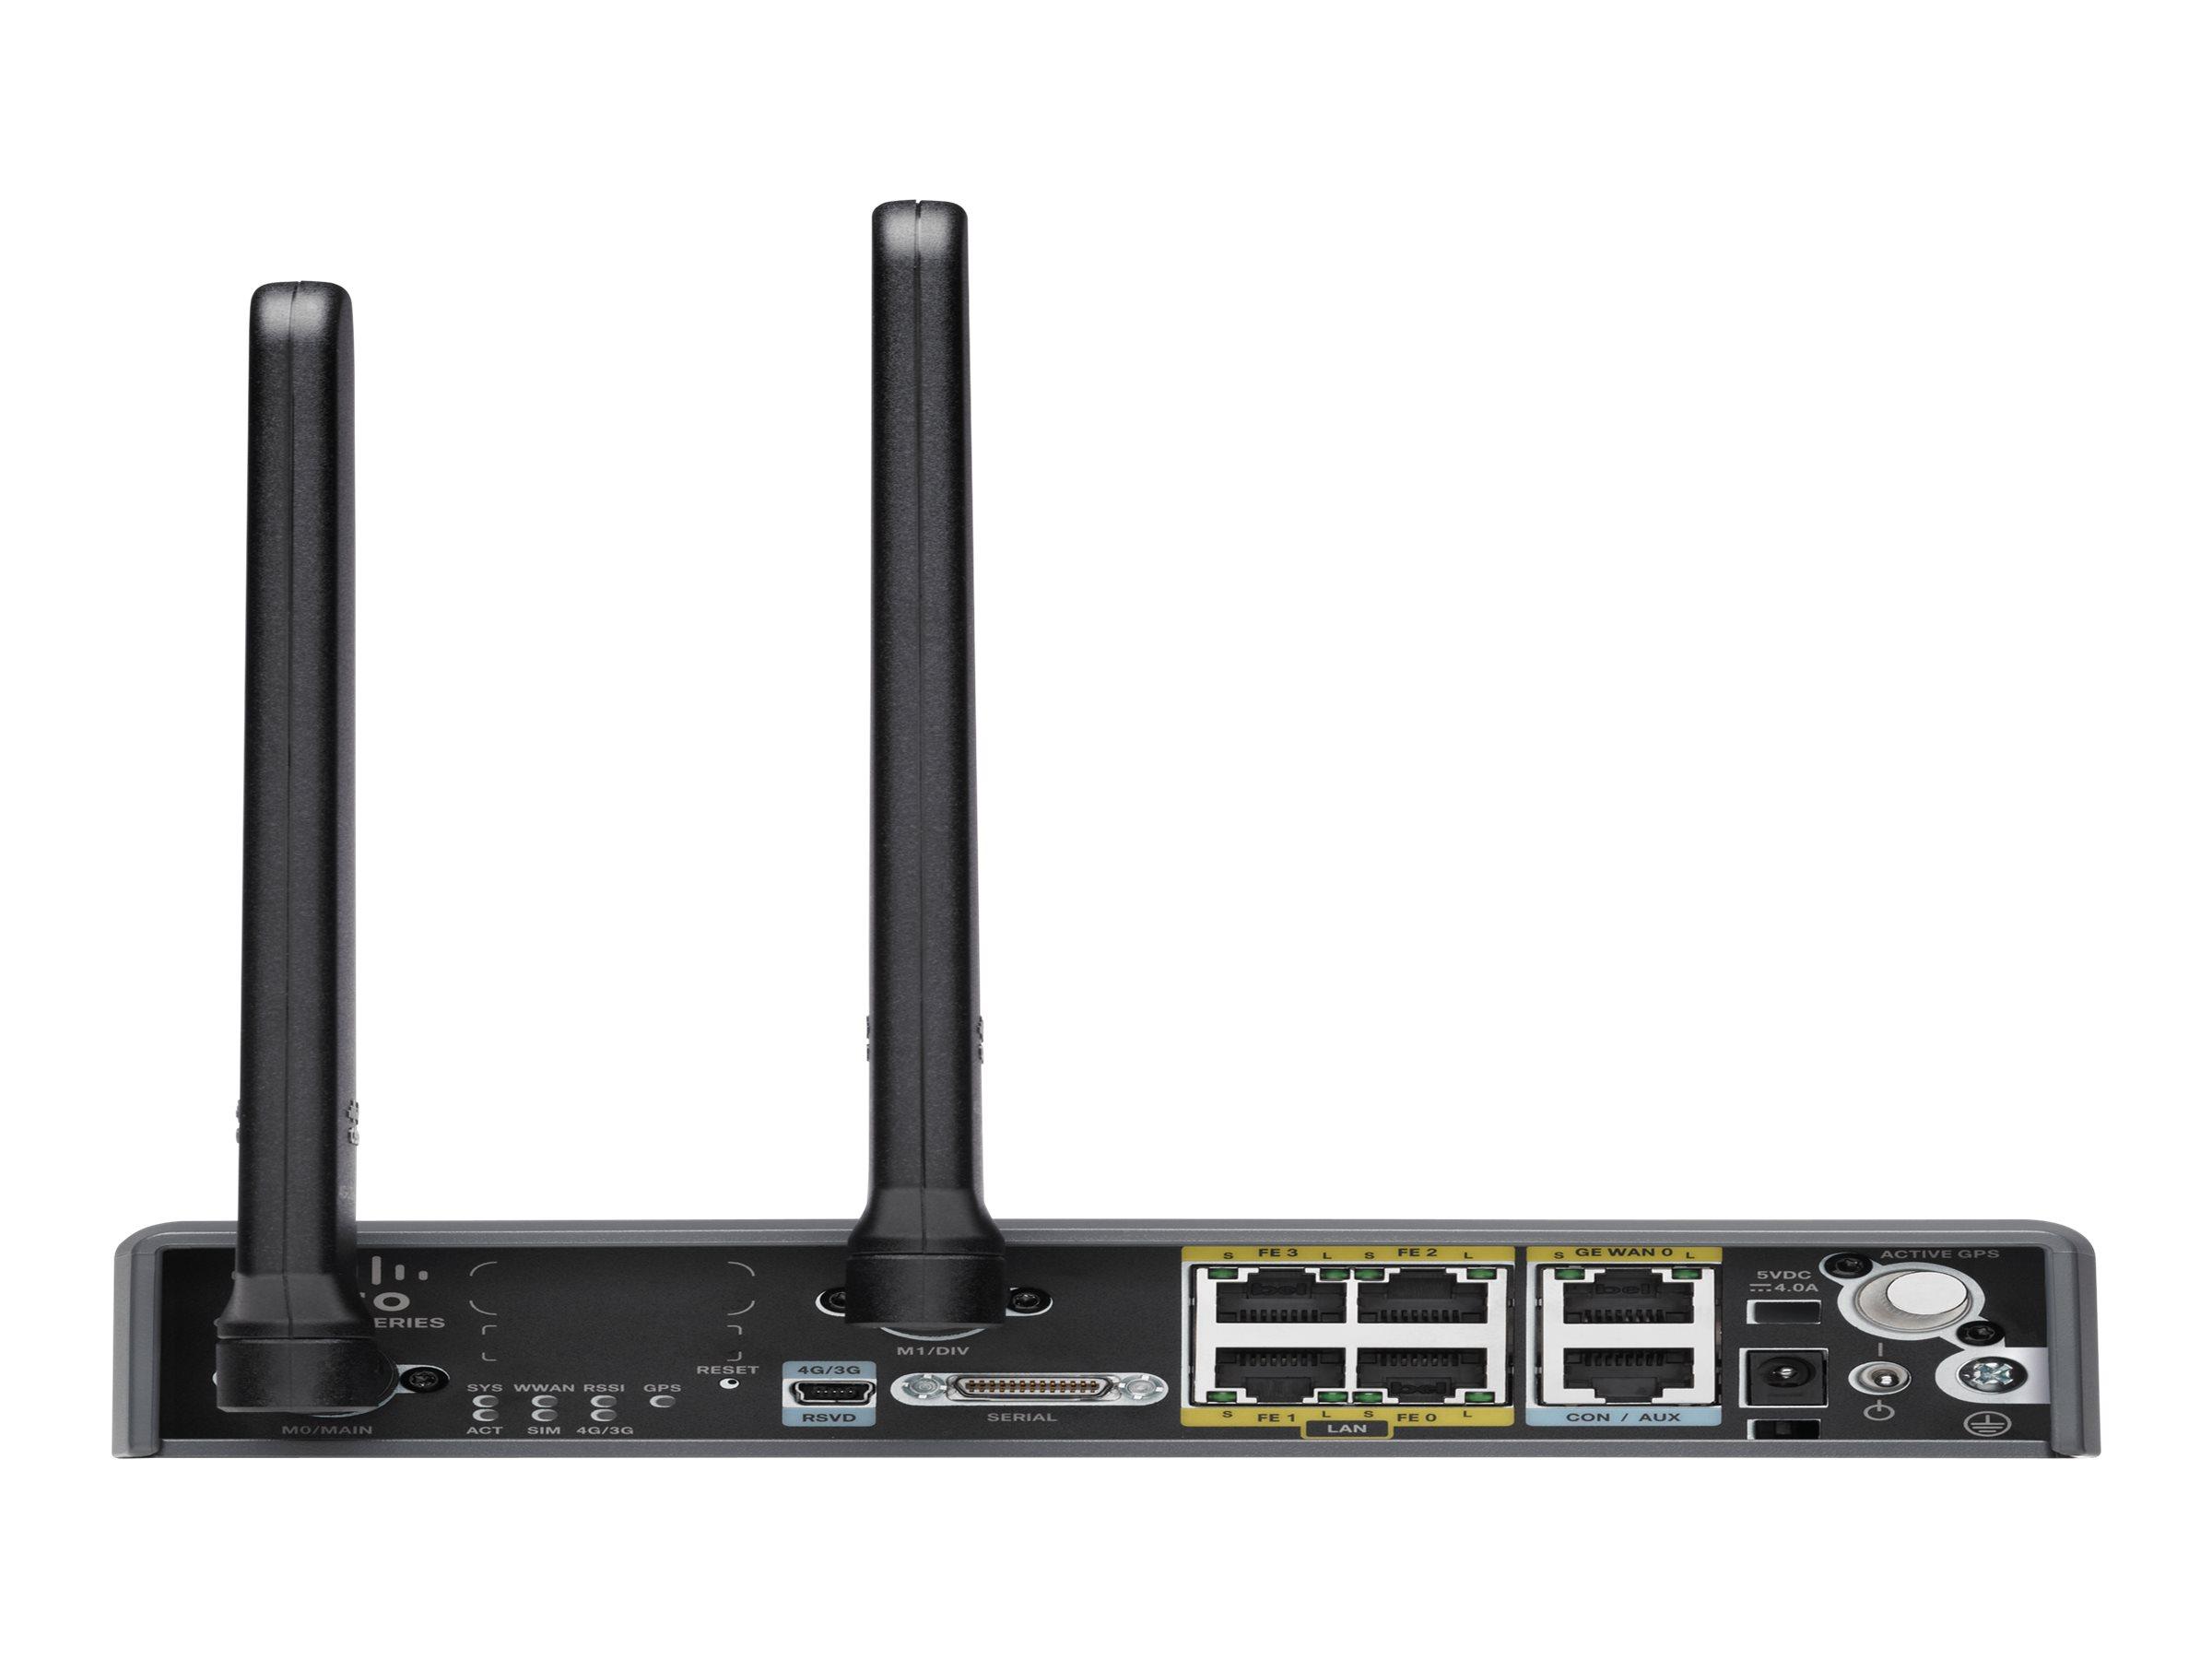 Cisco 819 4G LTE M2M Gateway - Router - WWAN - 4-Port-Switch AT&T